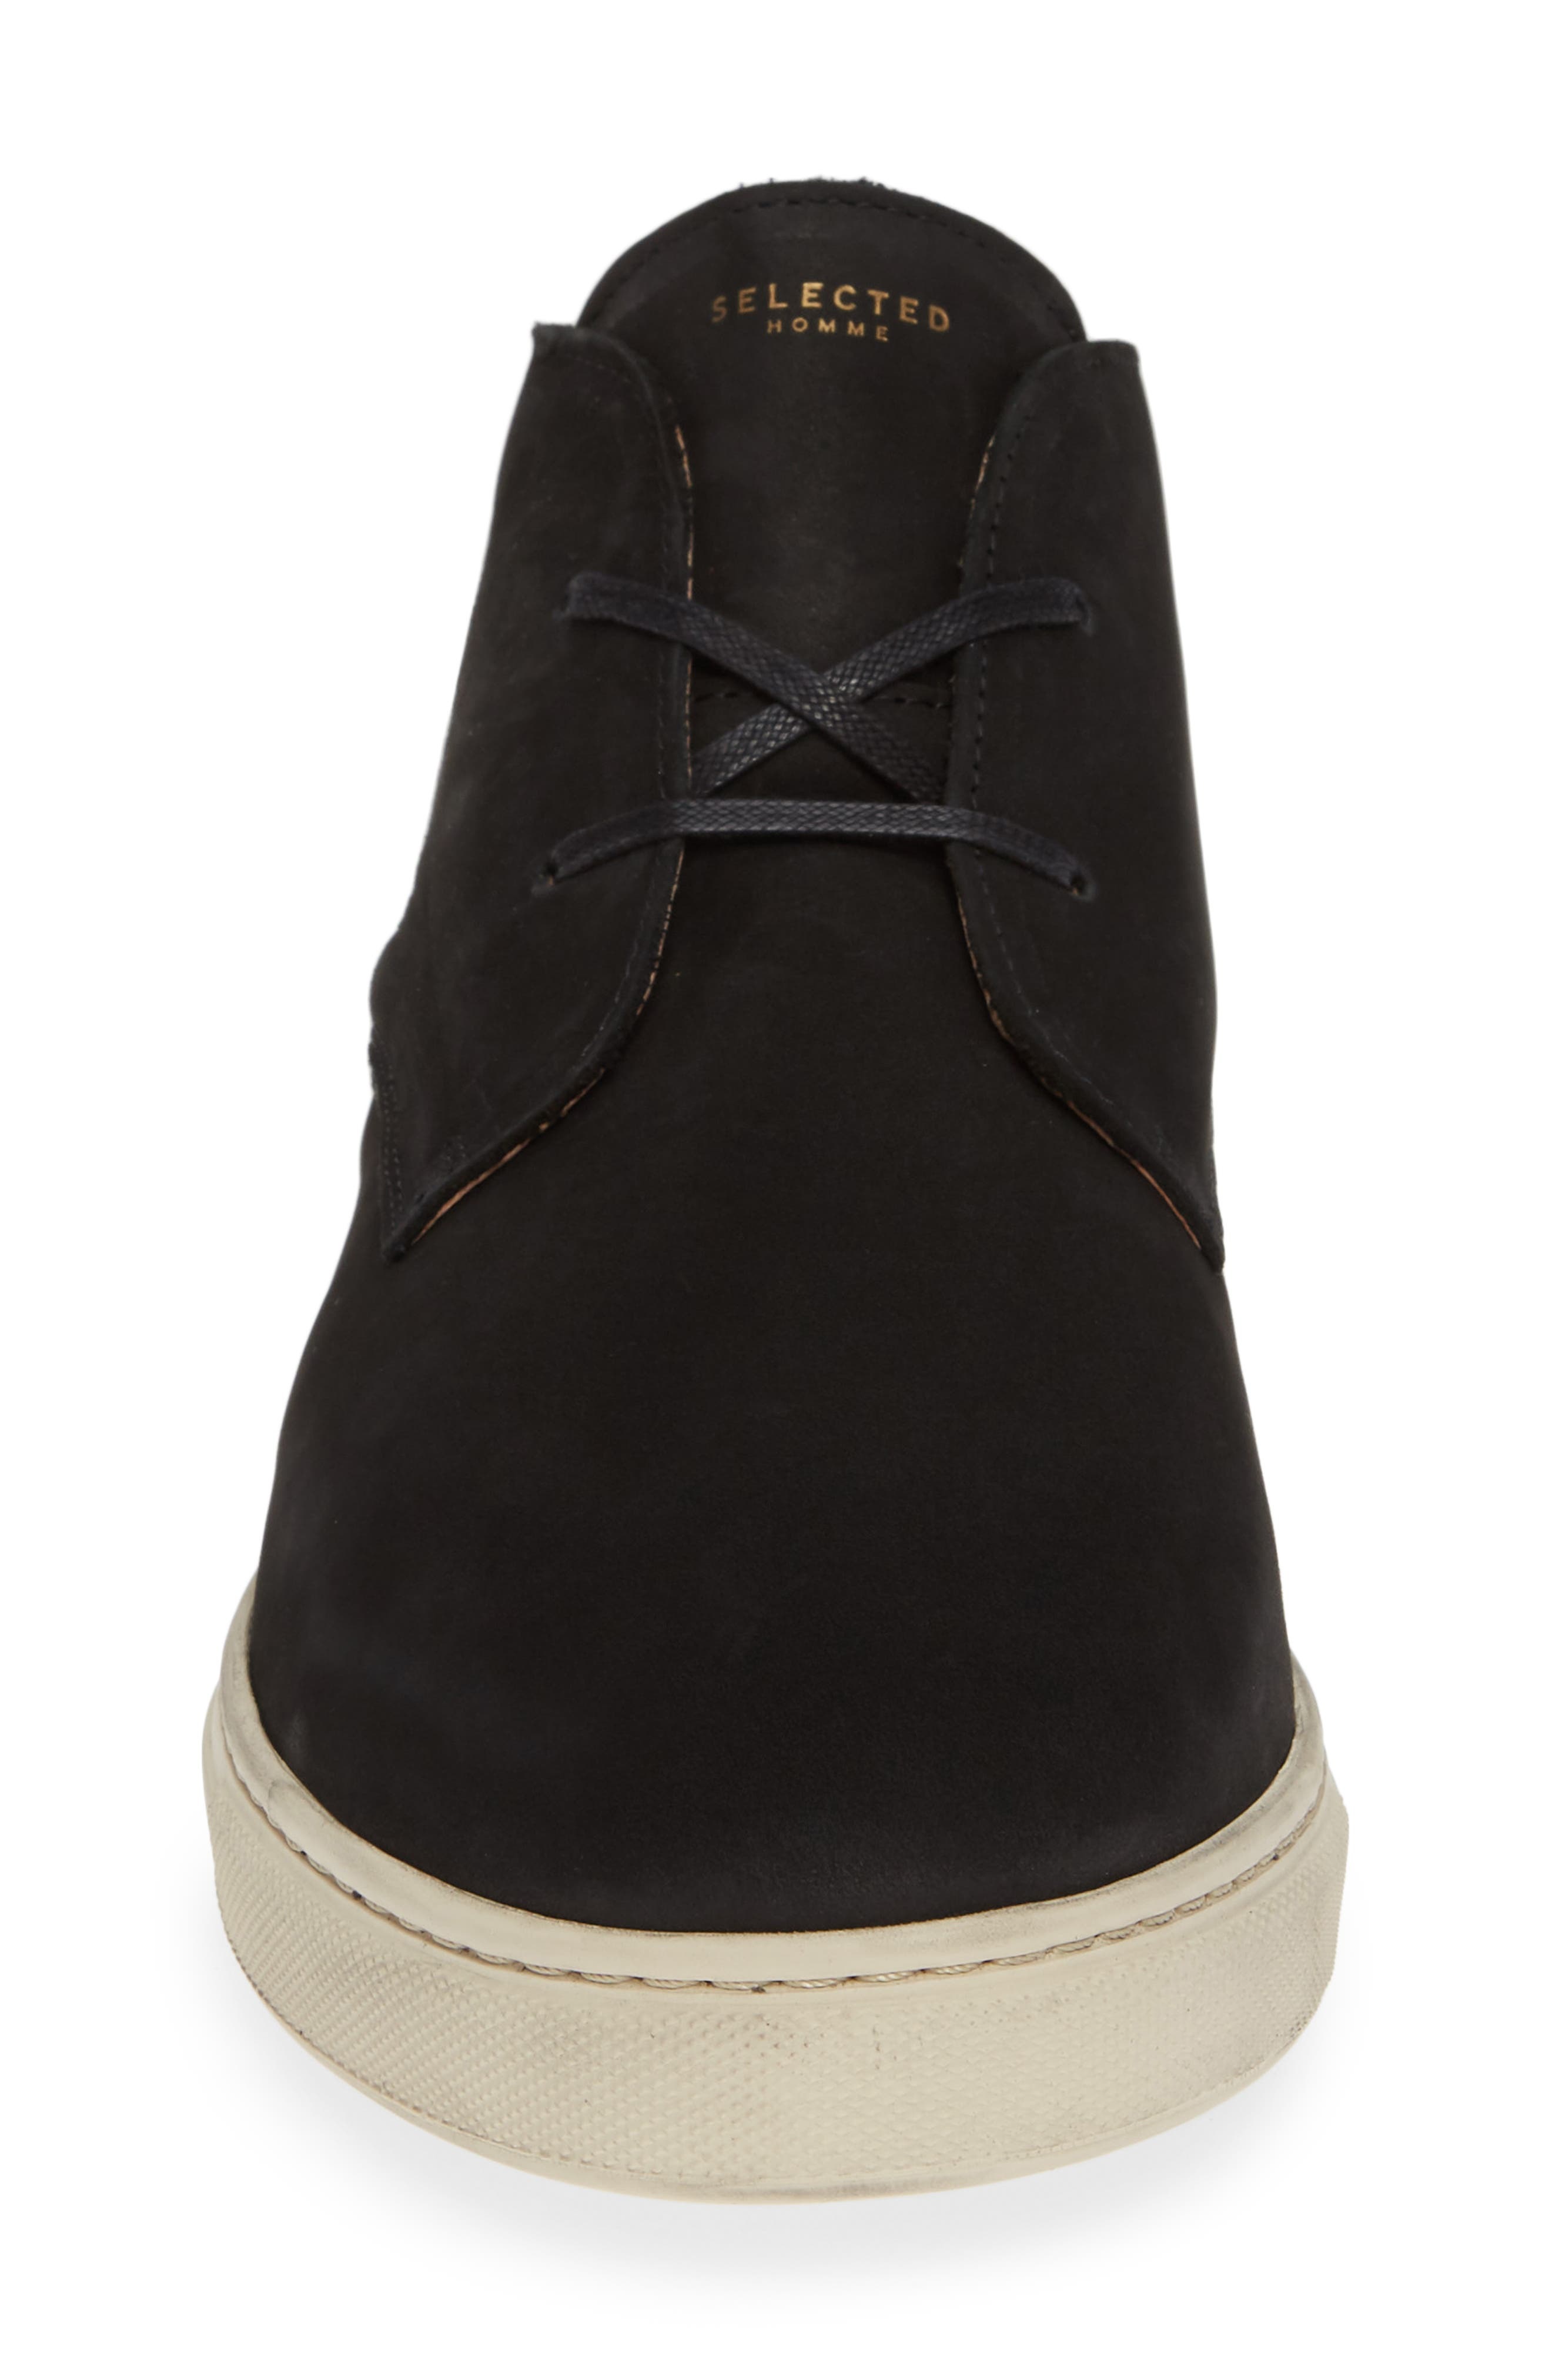 Dempsey Chukka Sneaker,                             Alternate thumbnail 4, color,                             BLACK